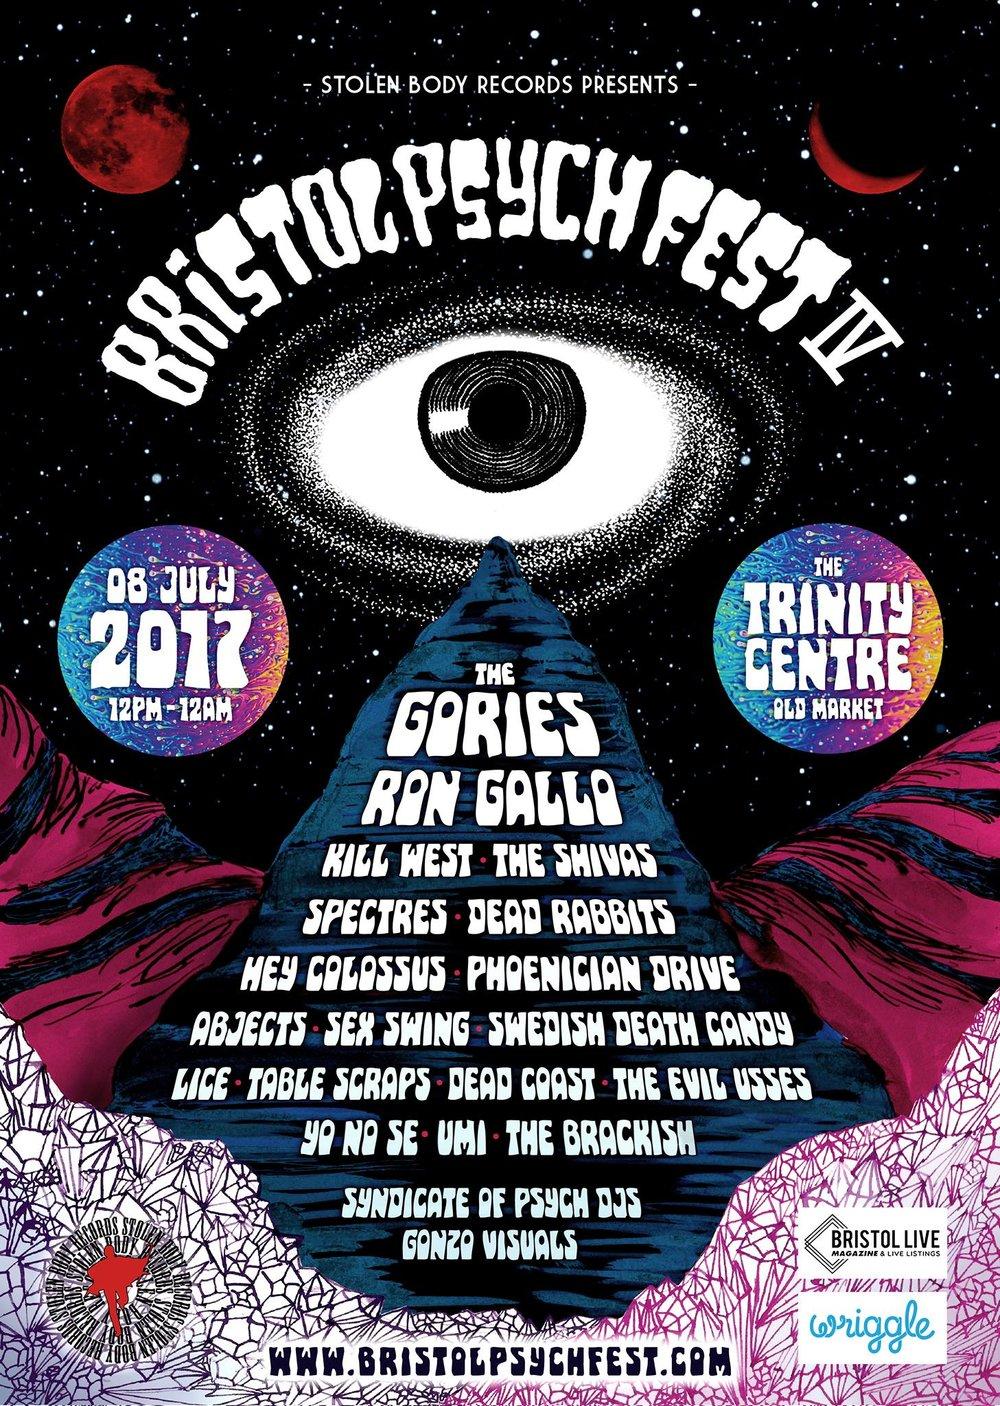 Bristol-Psych-Fest-IV-2017.jpg